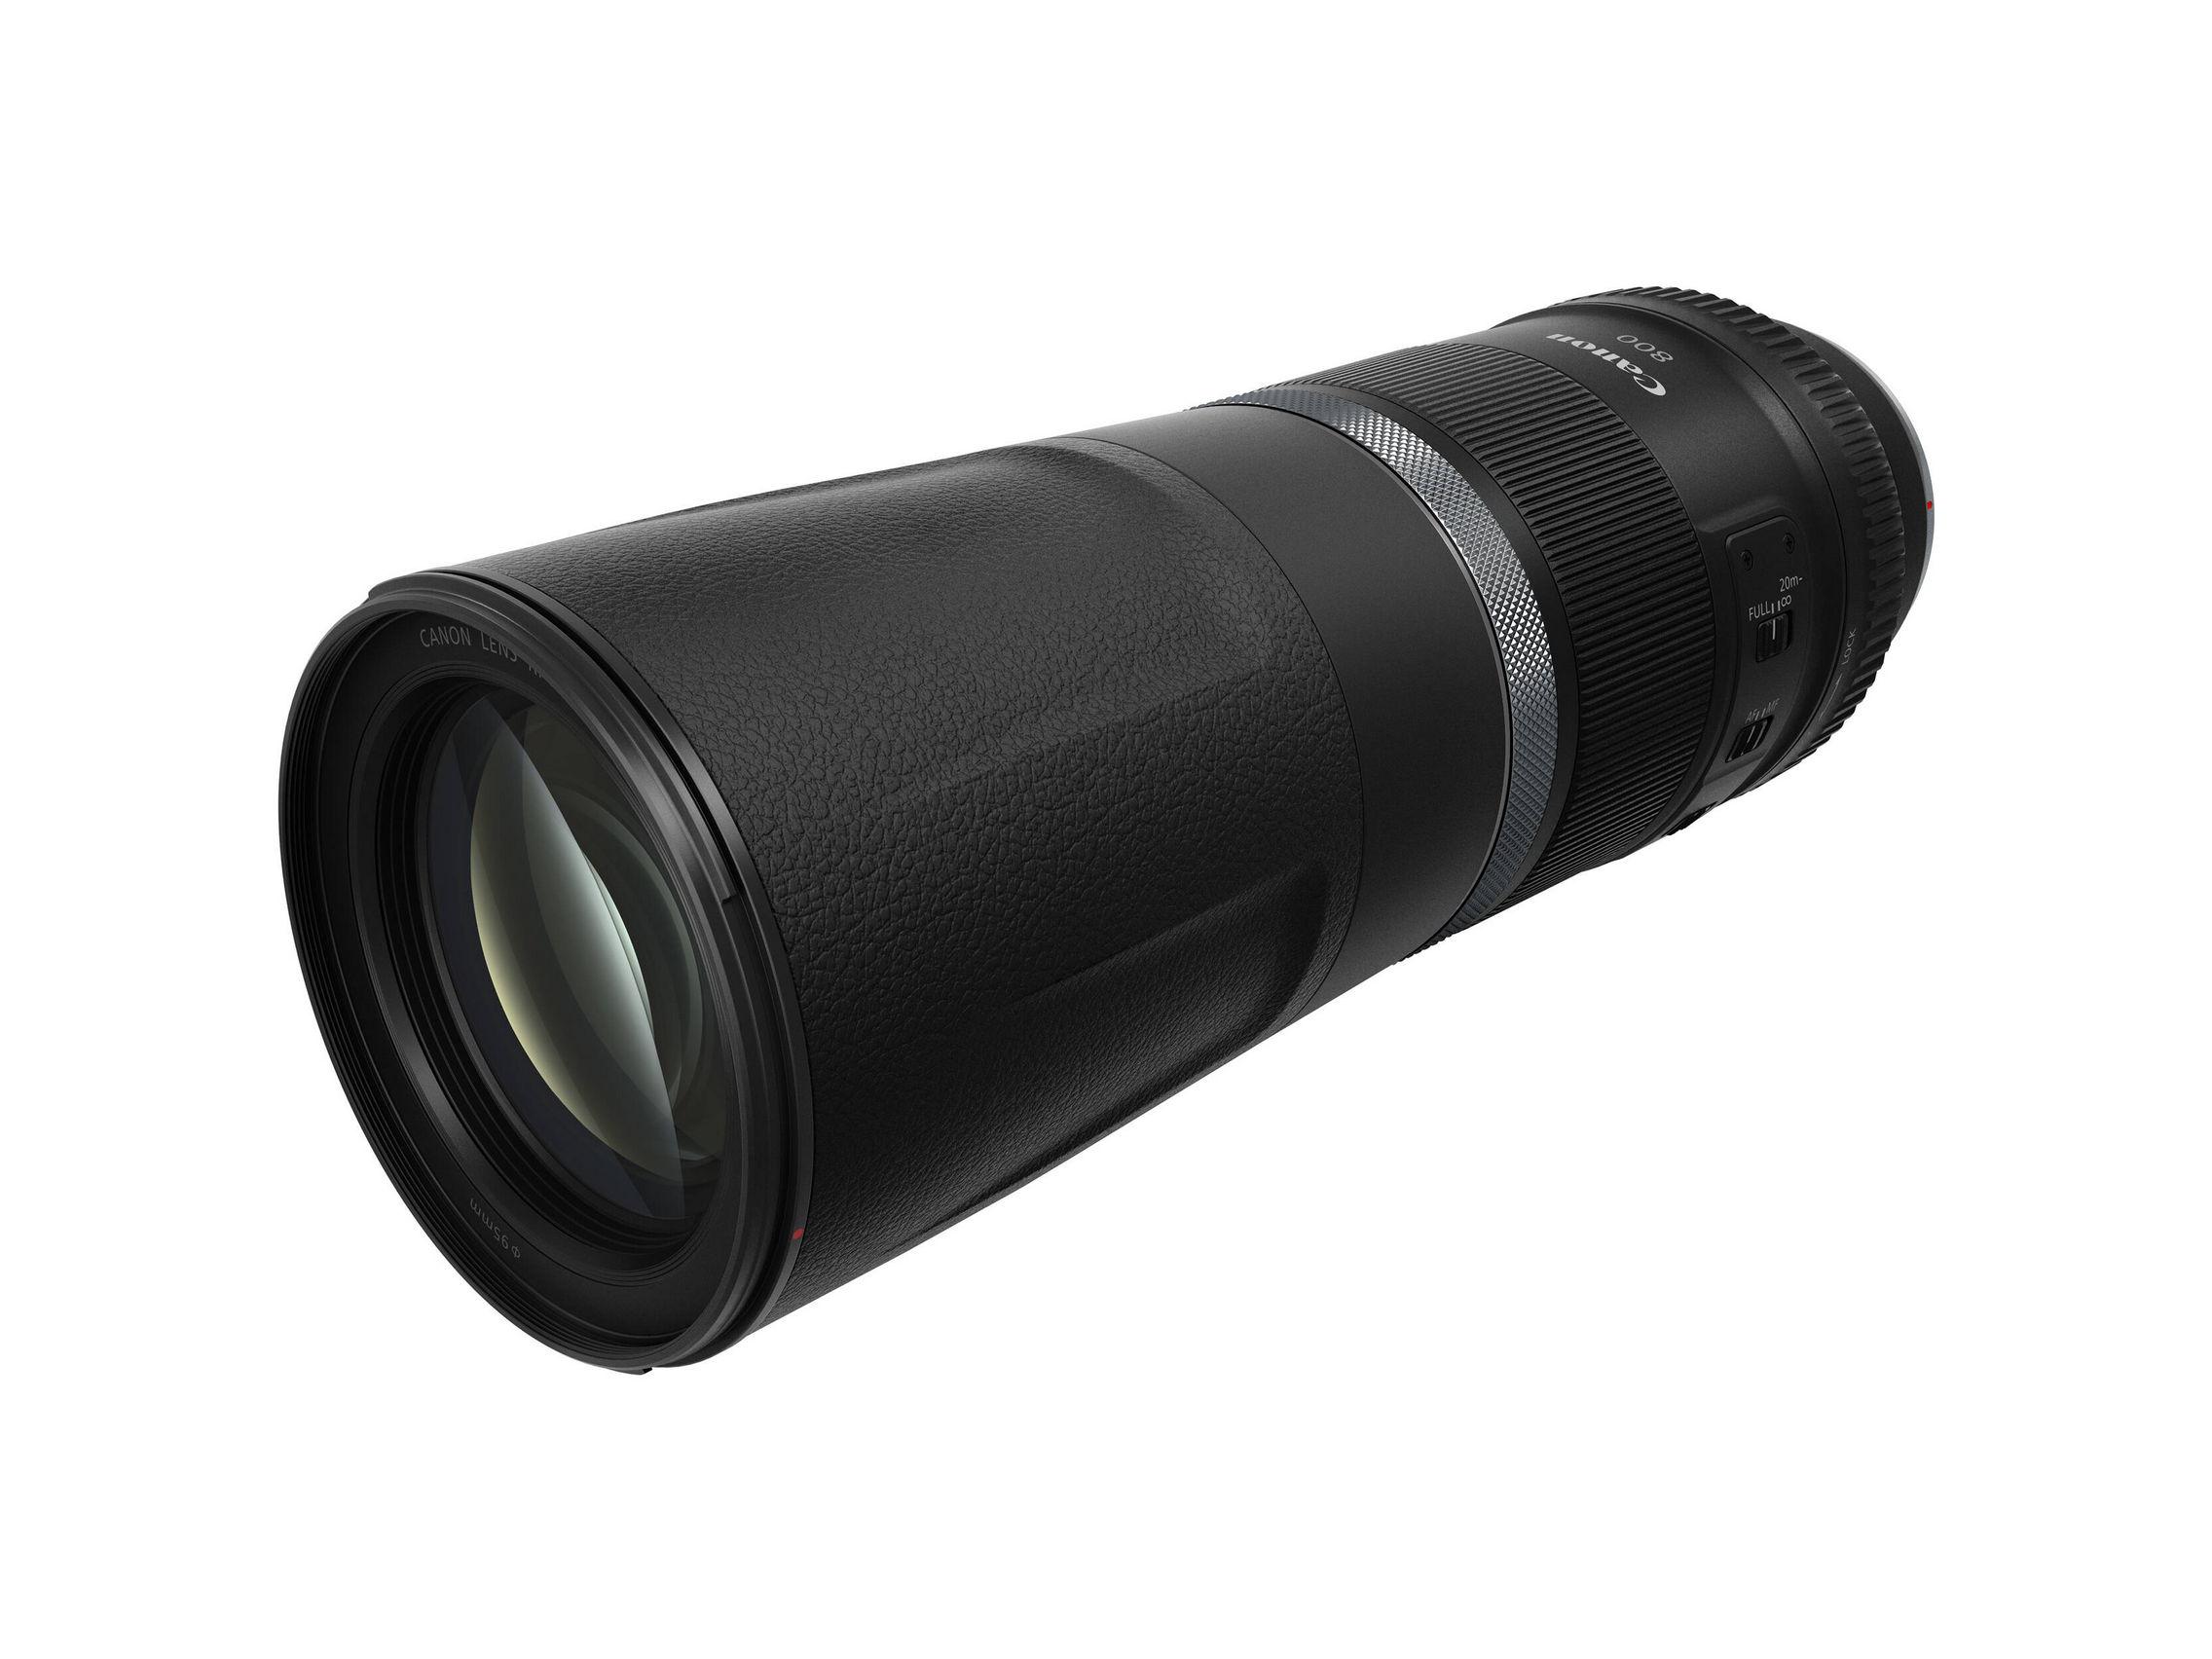 Canon Lens RF 800mm F11 IS STM